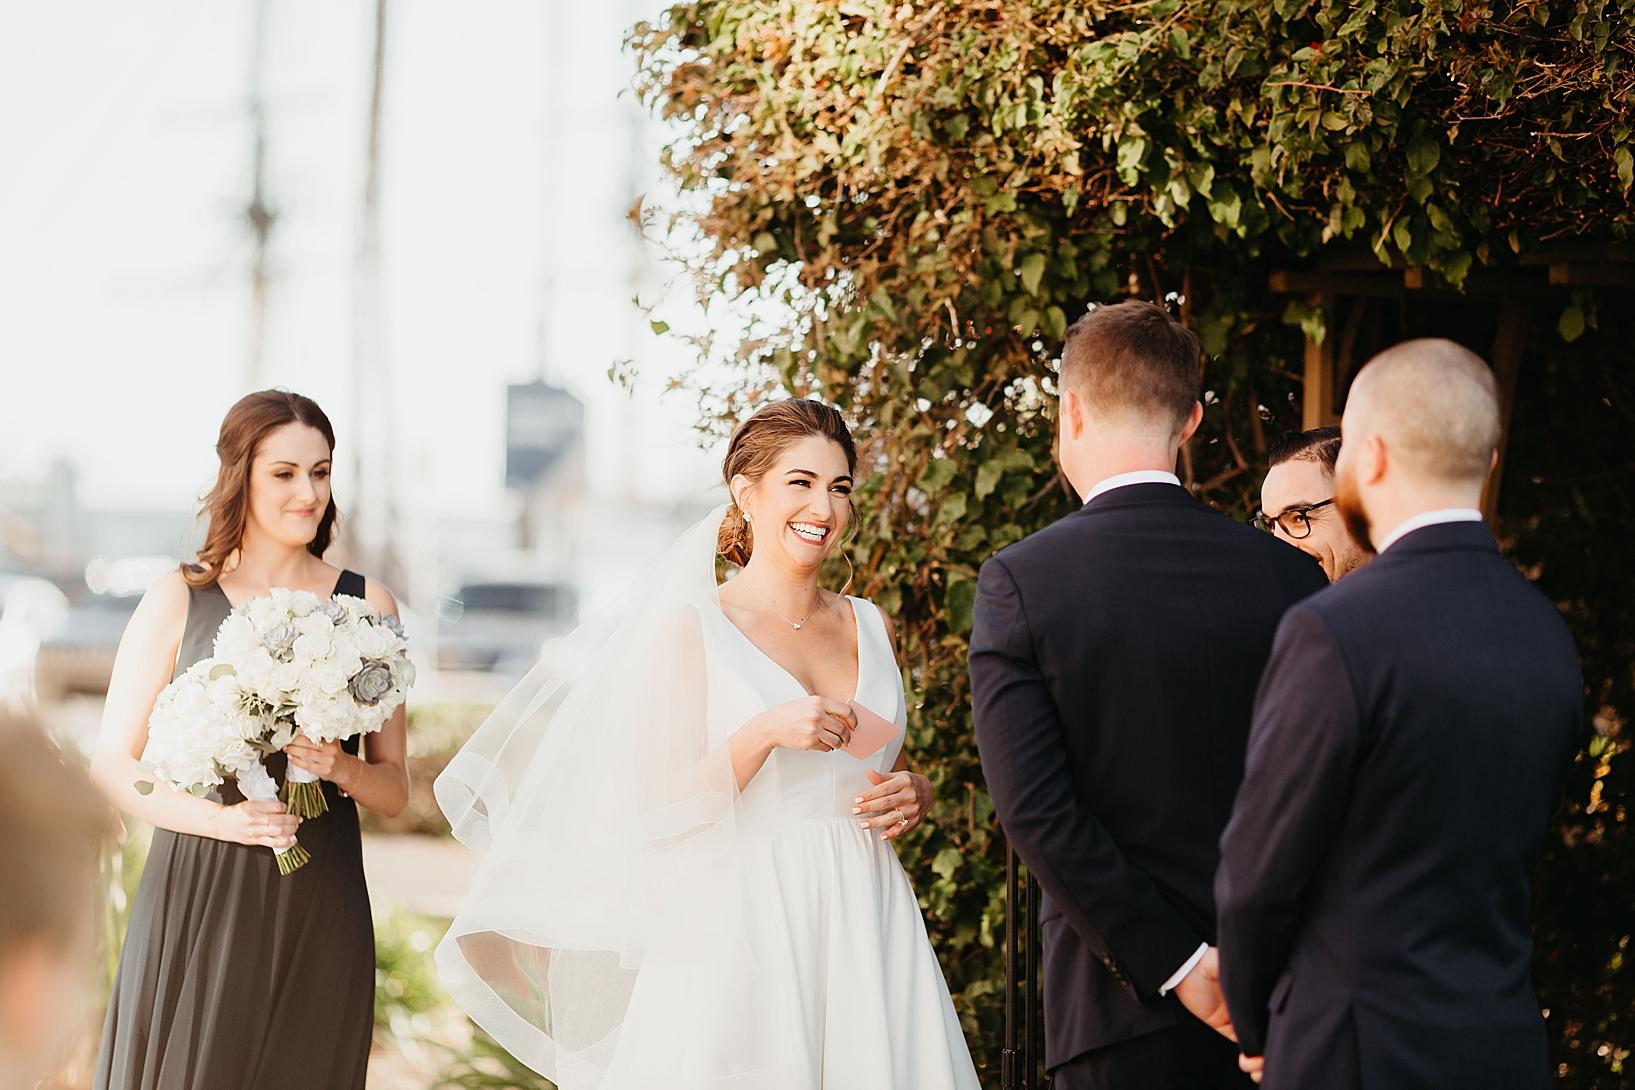 Herb-and-Wood-Wedding-39.jpg